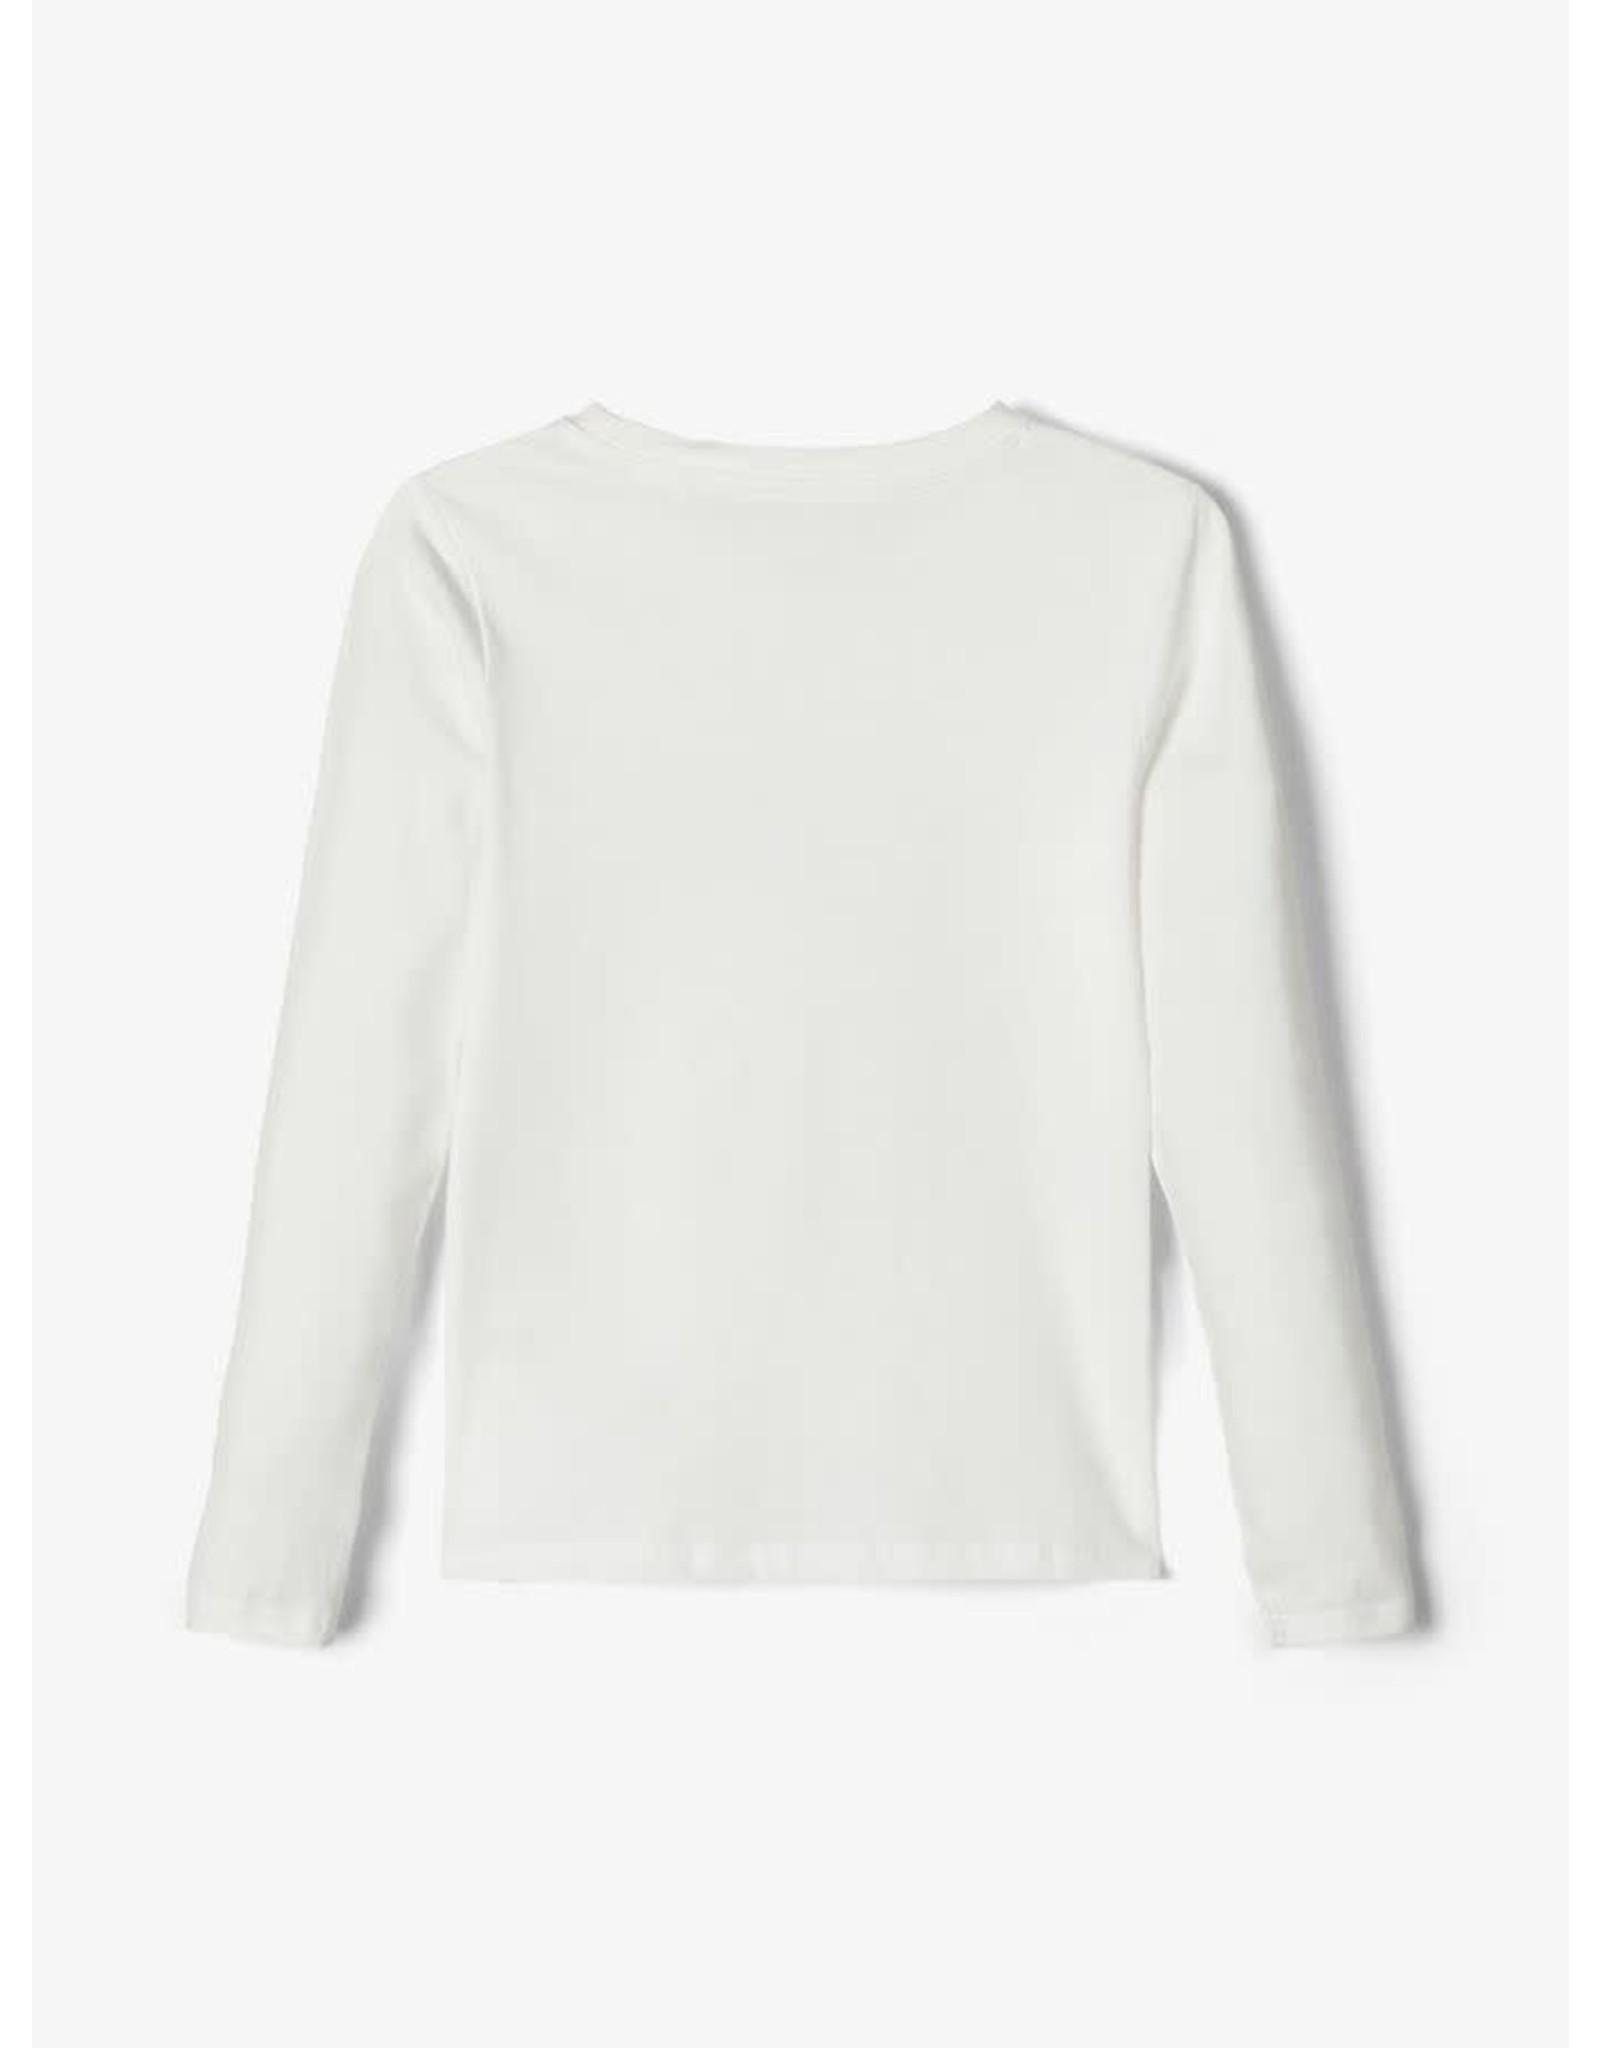 Name It Basis t-shirt wit met grafische print